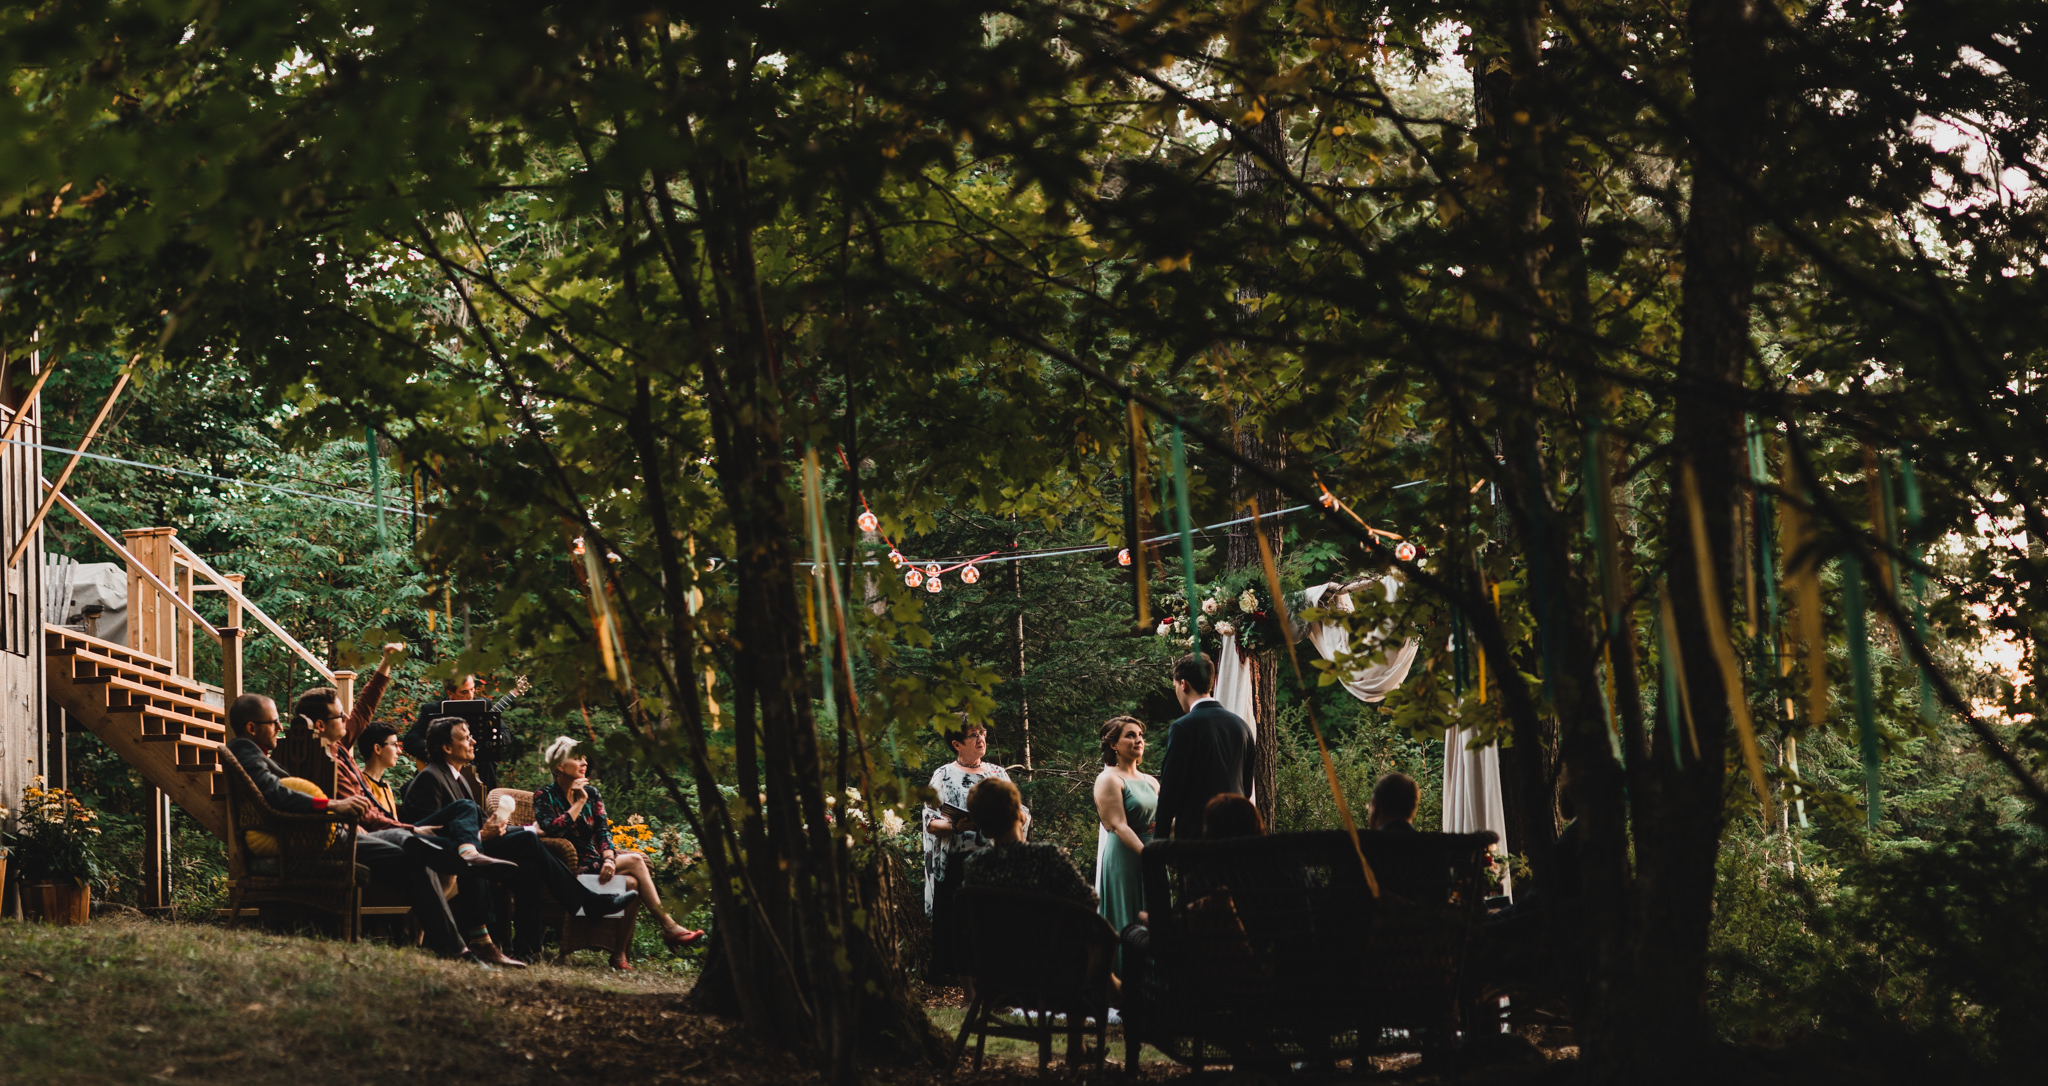 Intimate, Elopement wedding